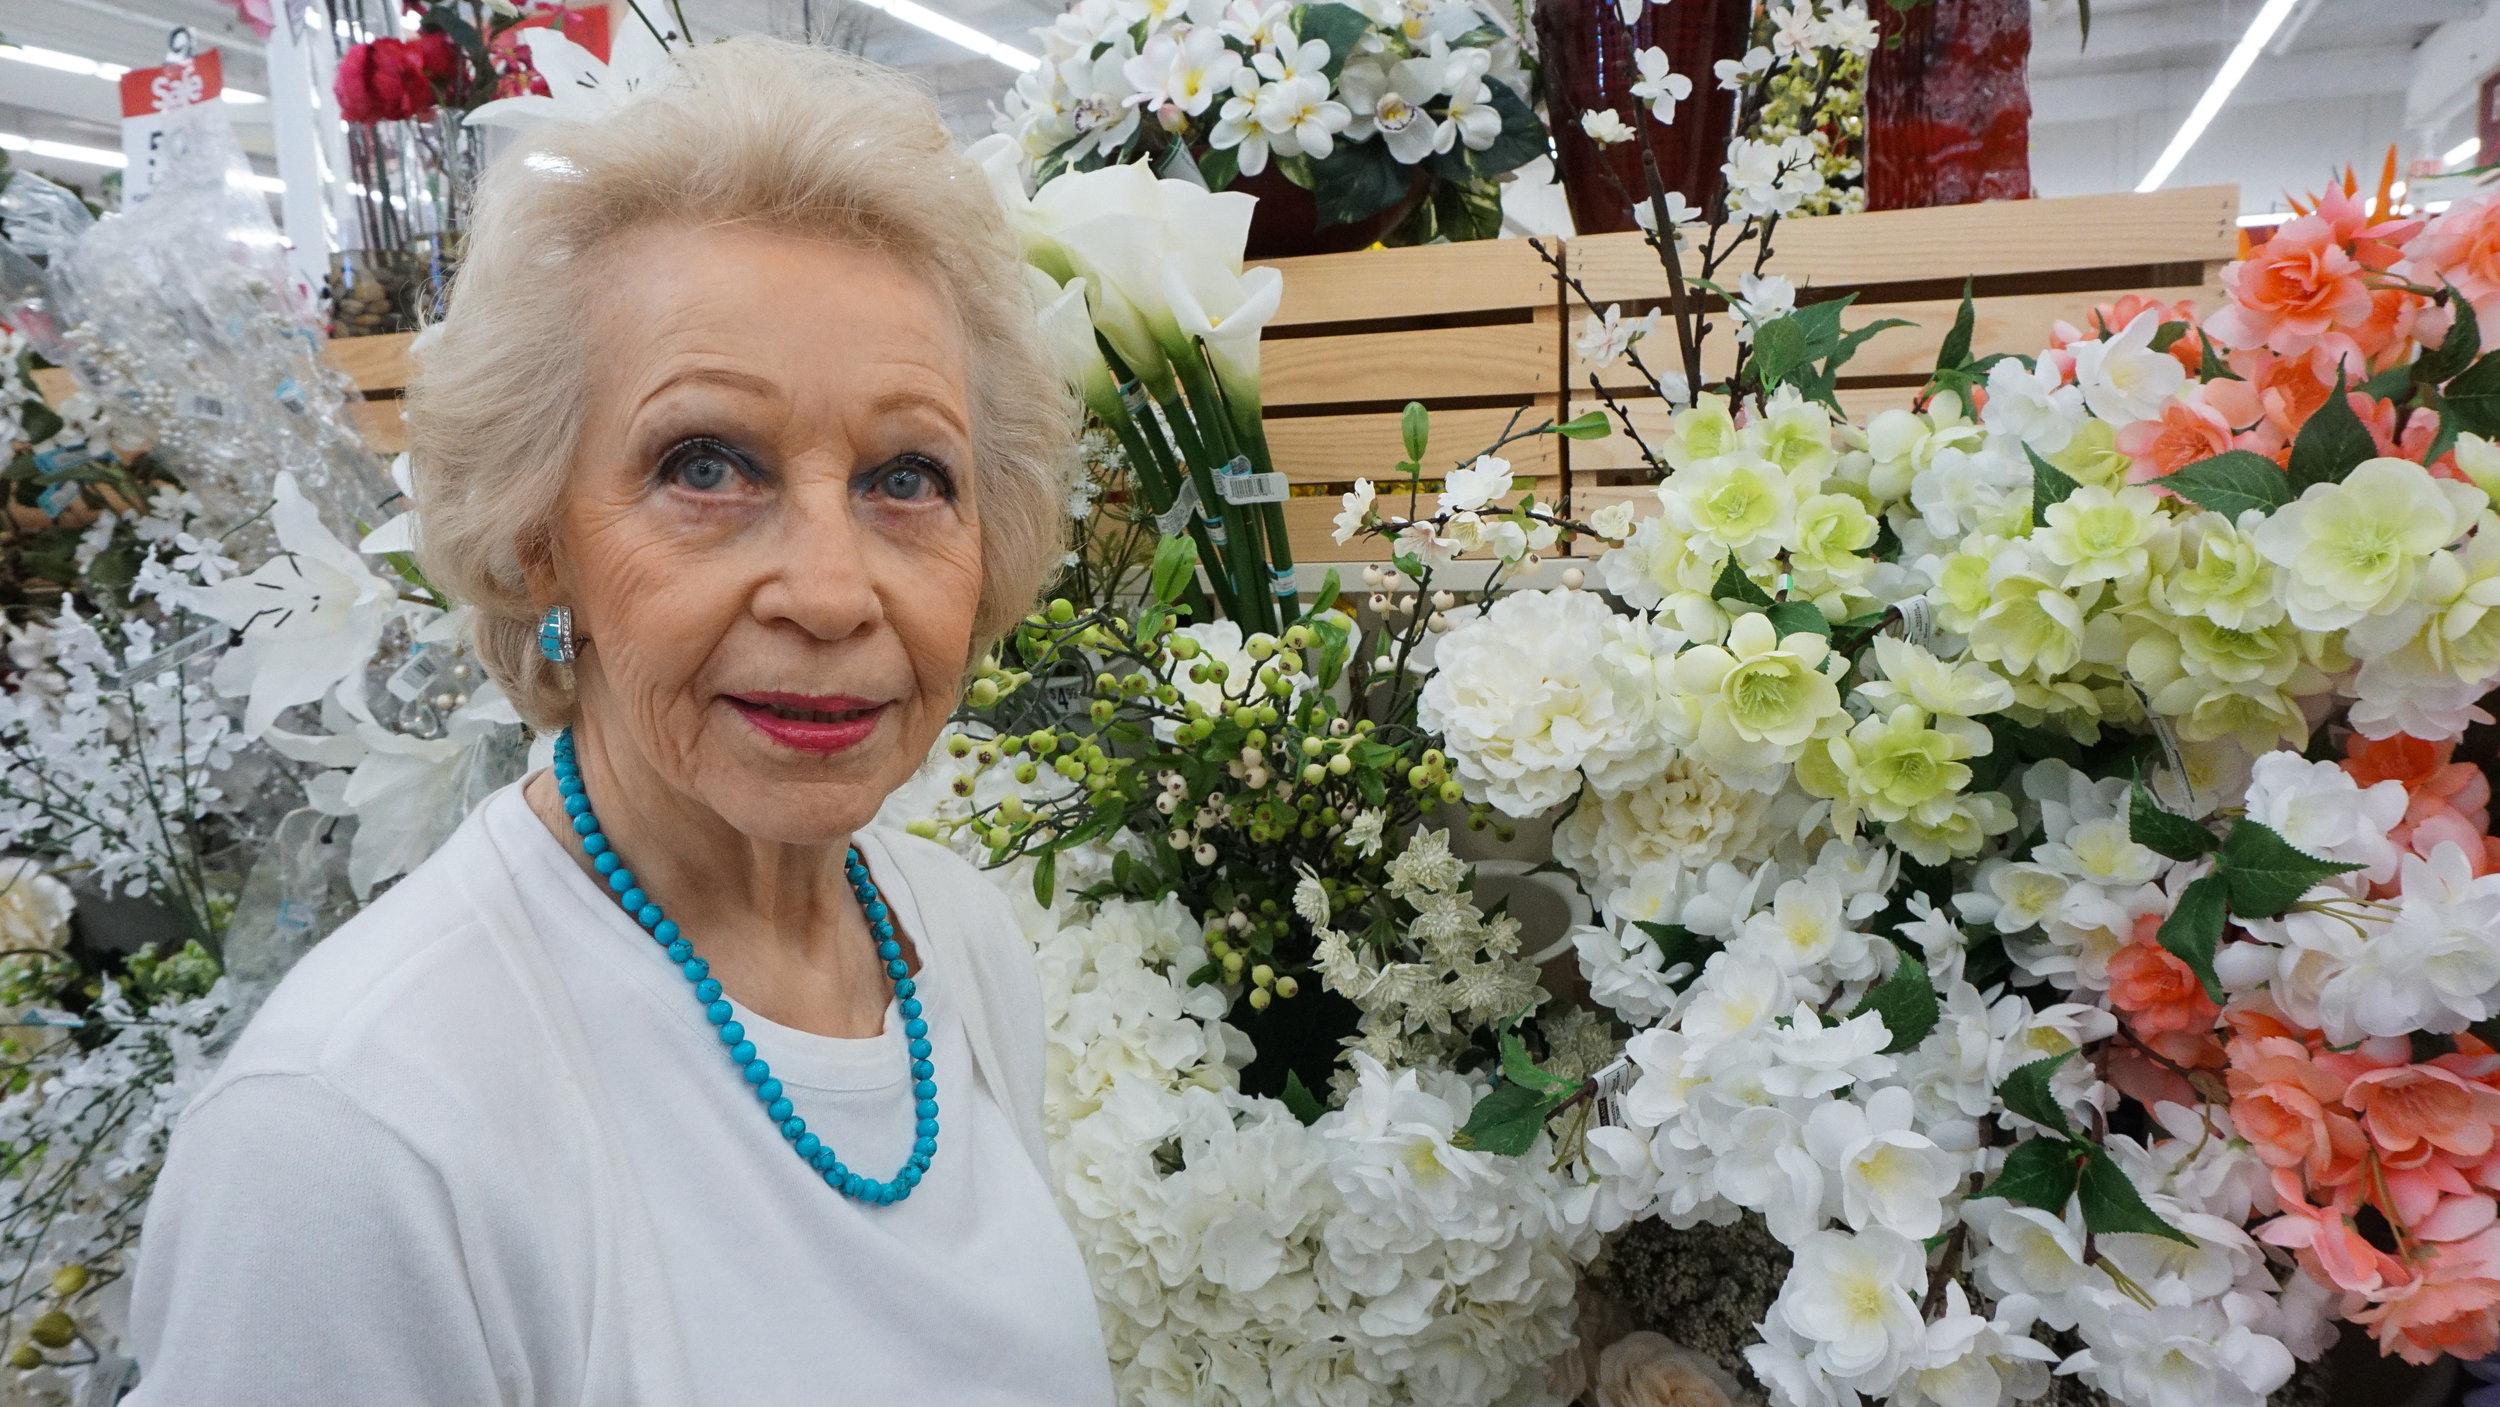 10-White-lady-2-07376.jpg